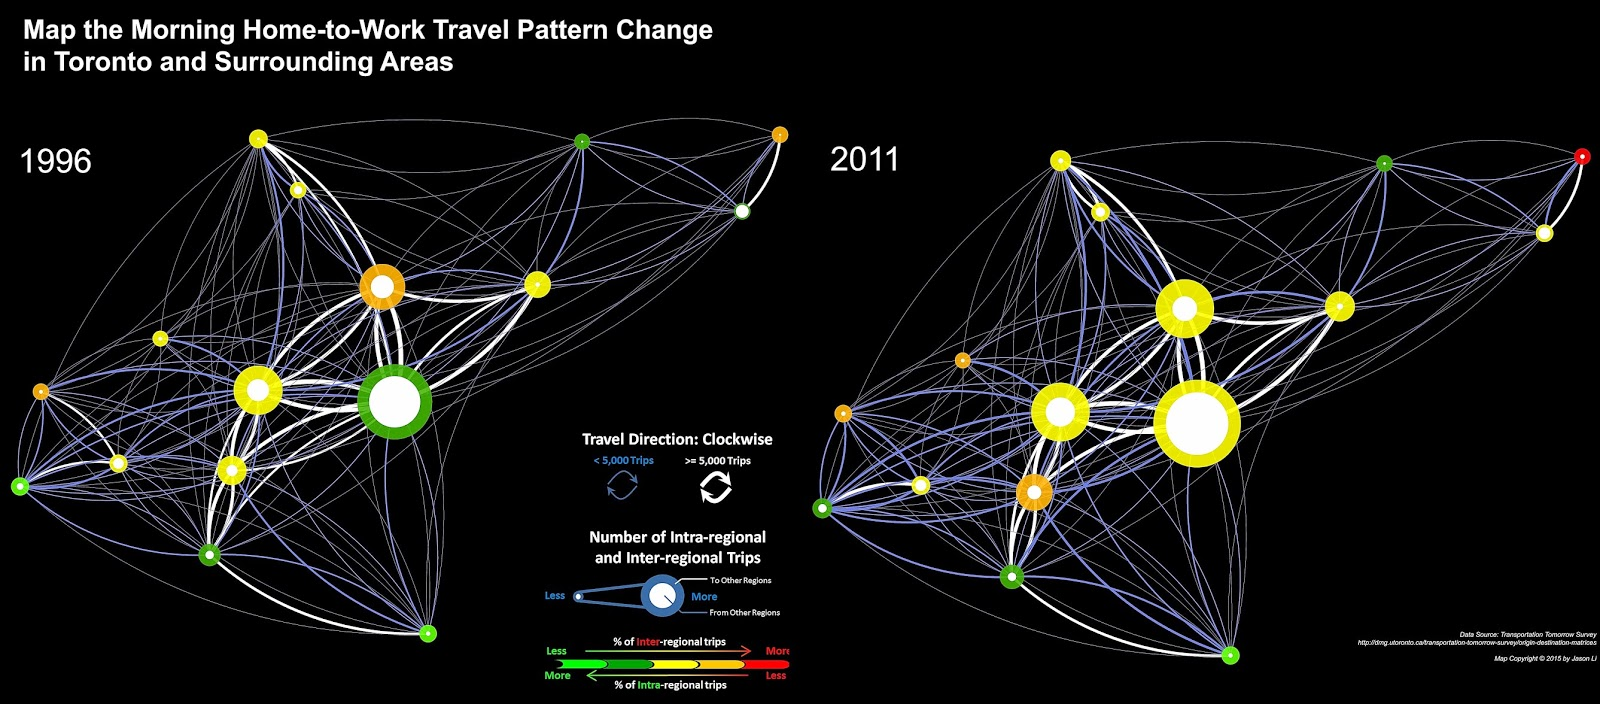 Ecm blog transportation data visualization 1 origin destination transportation data visualization 1 origin destination and migration flow visualization migration flow data visualization using chord diagrams pooptronica